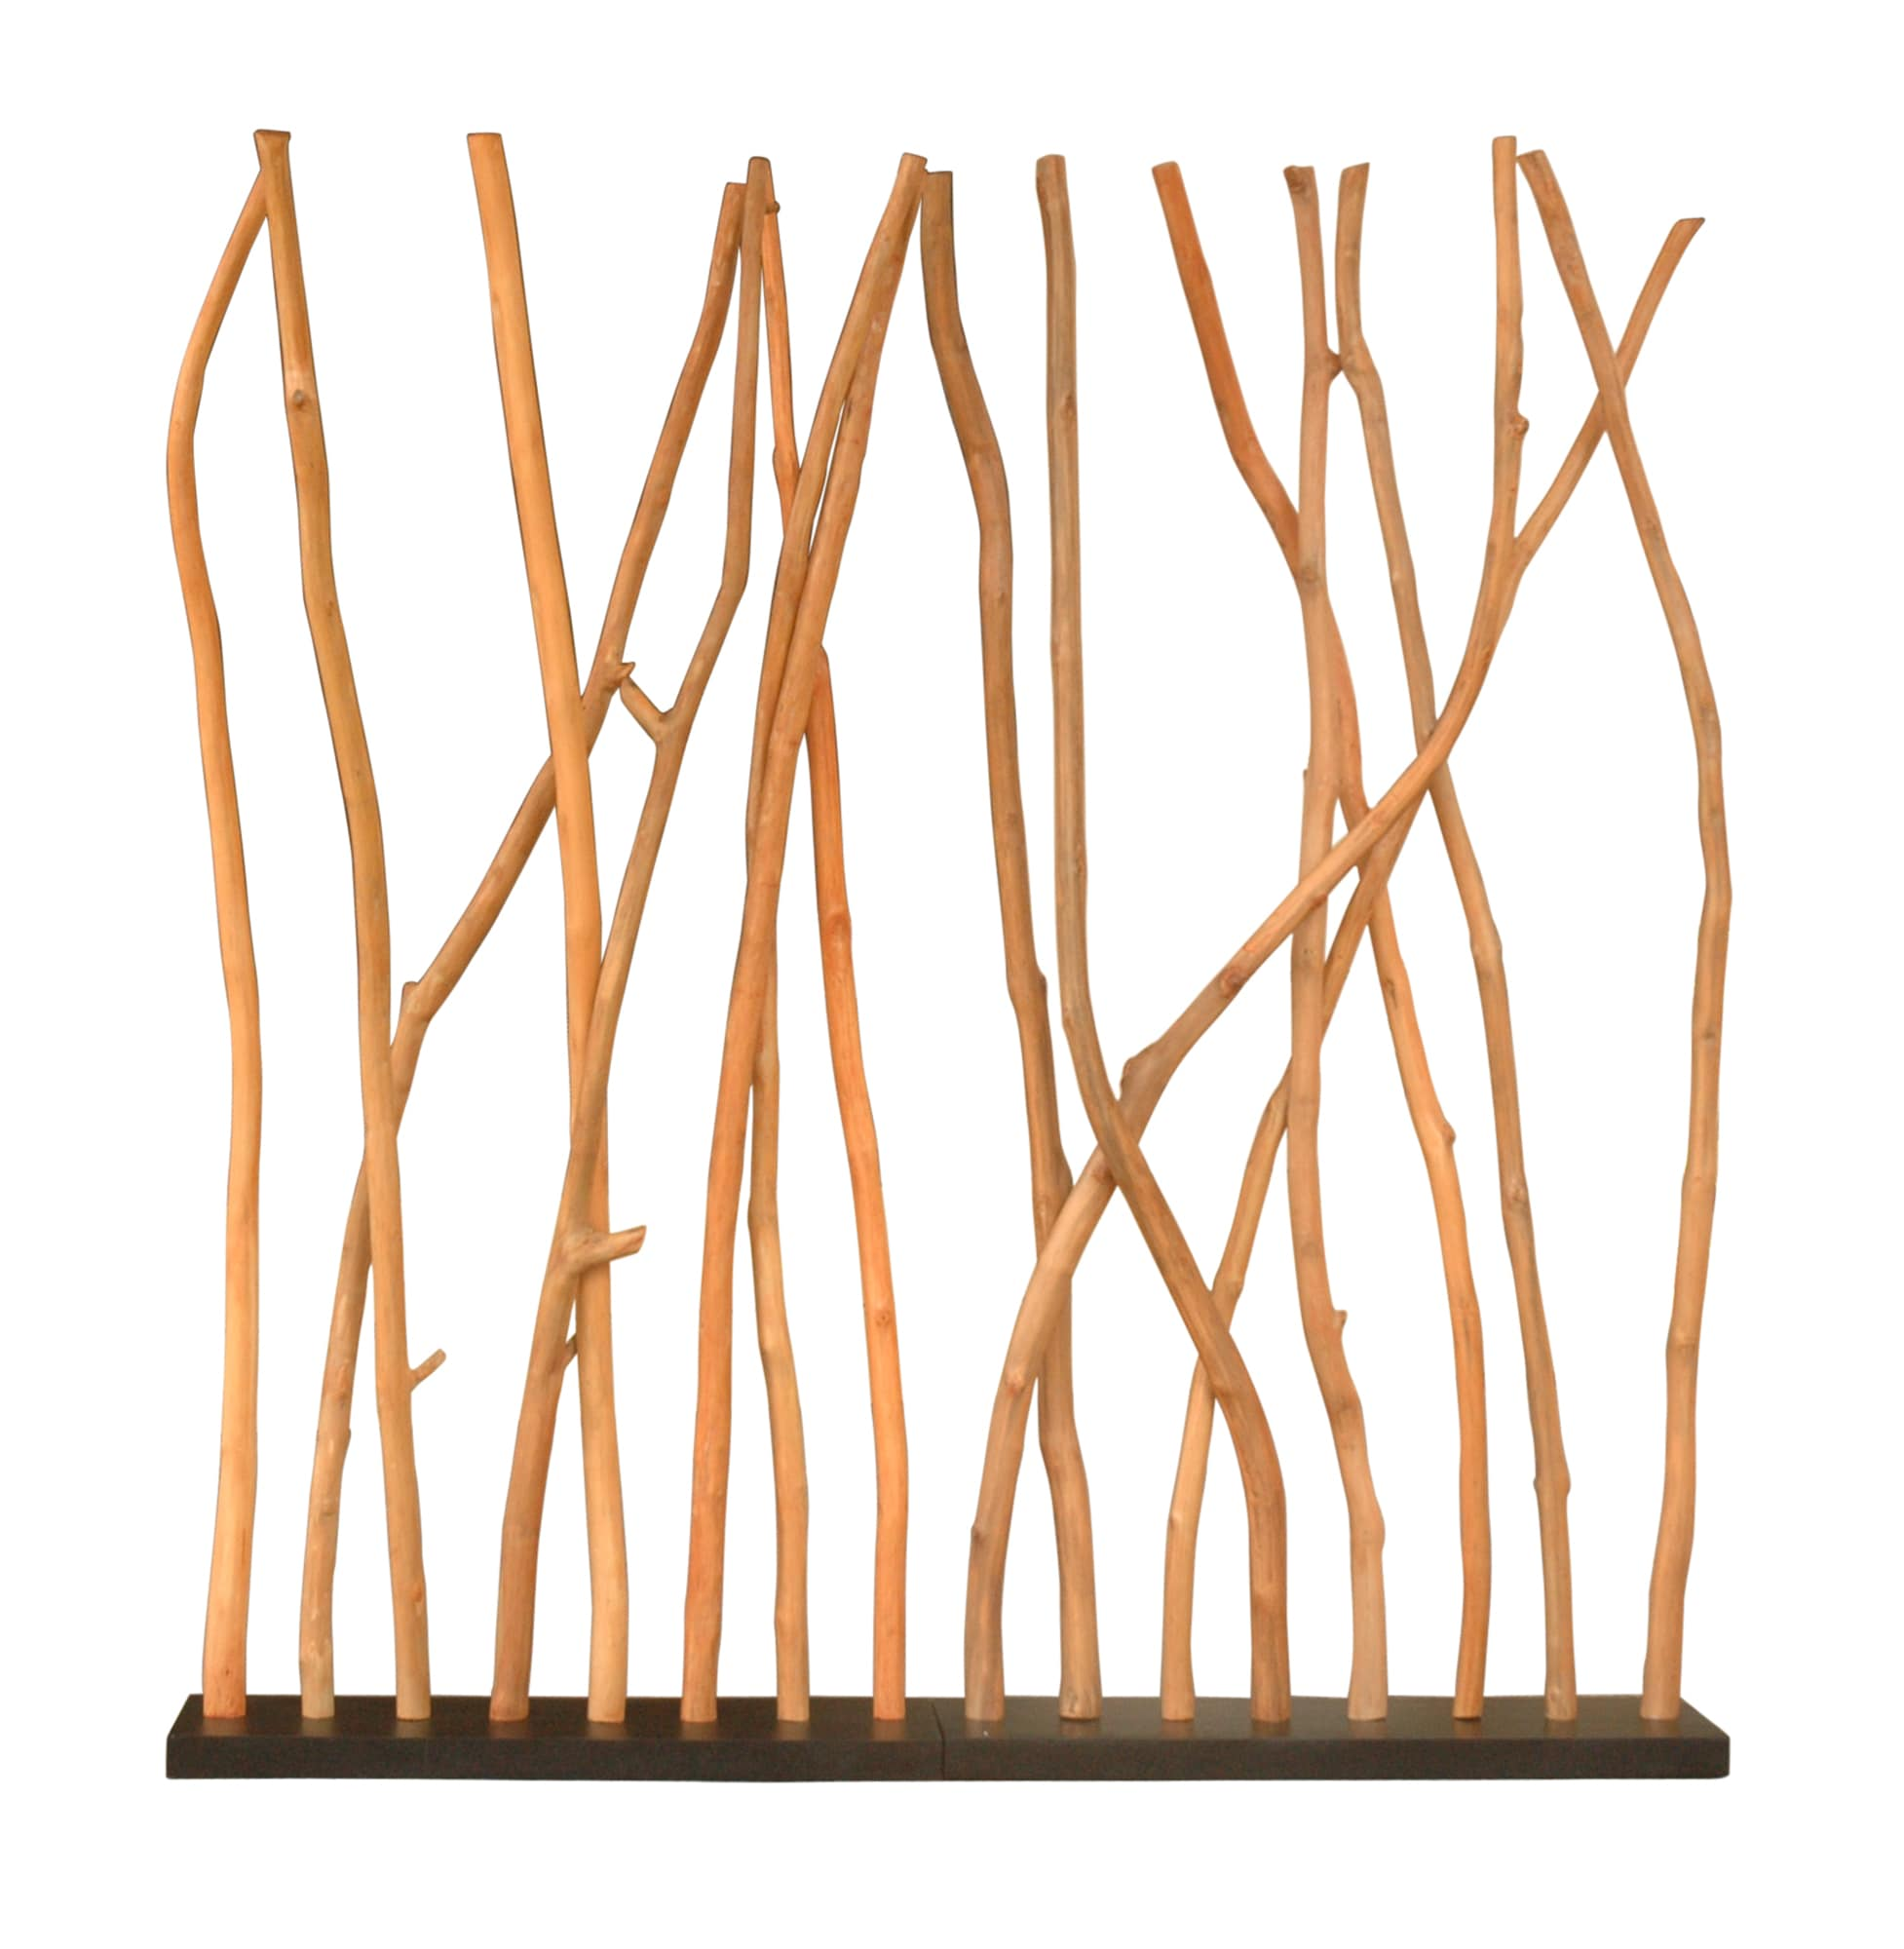 Decorative Tan Contemporary Teak Wood Divider